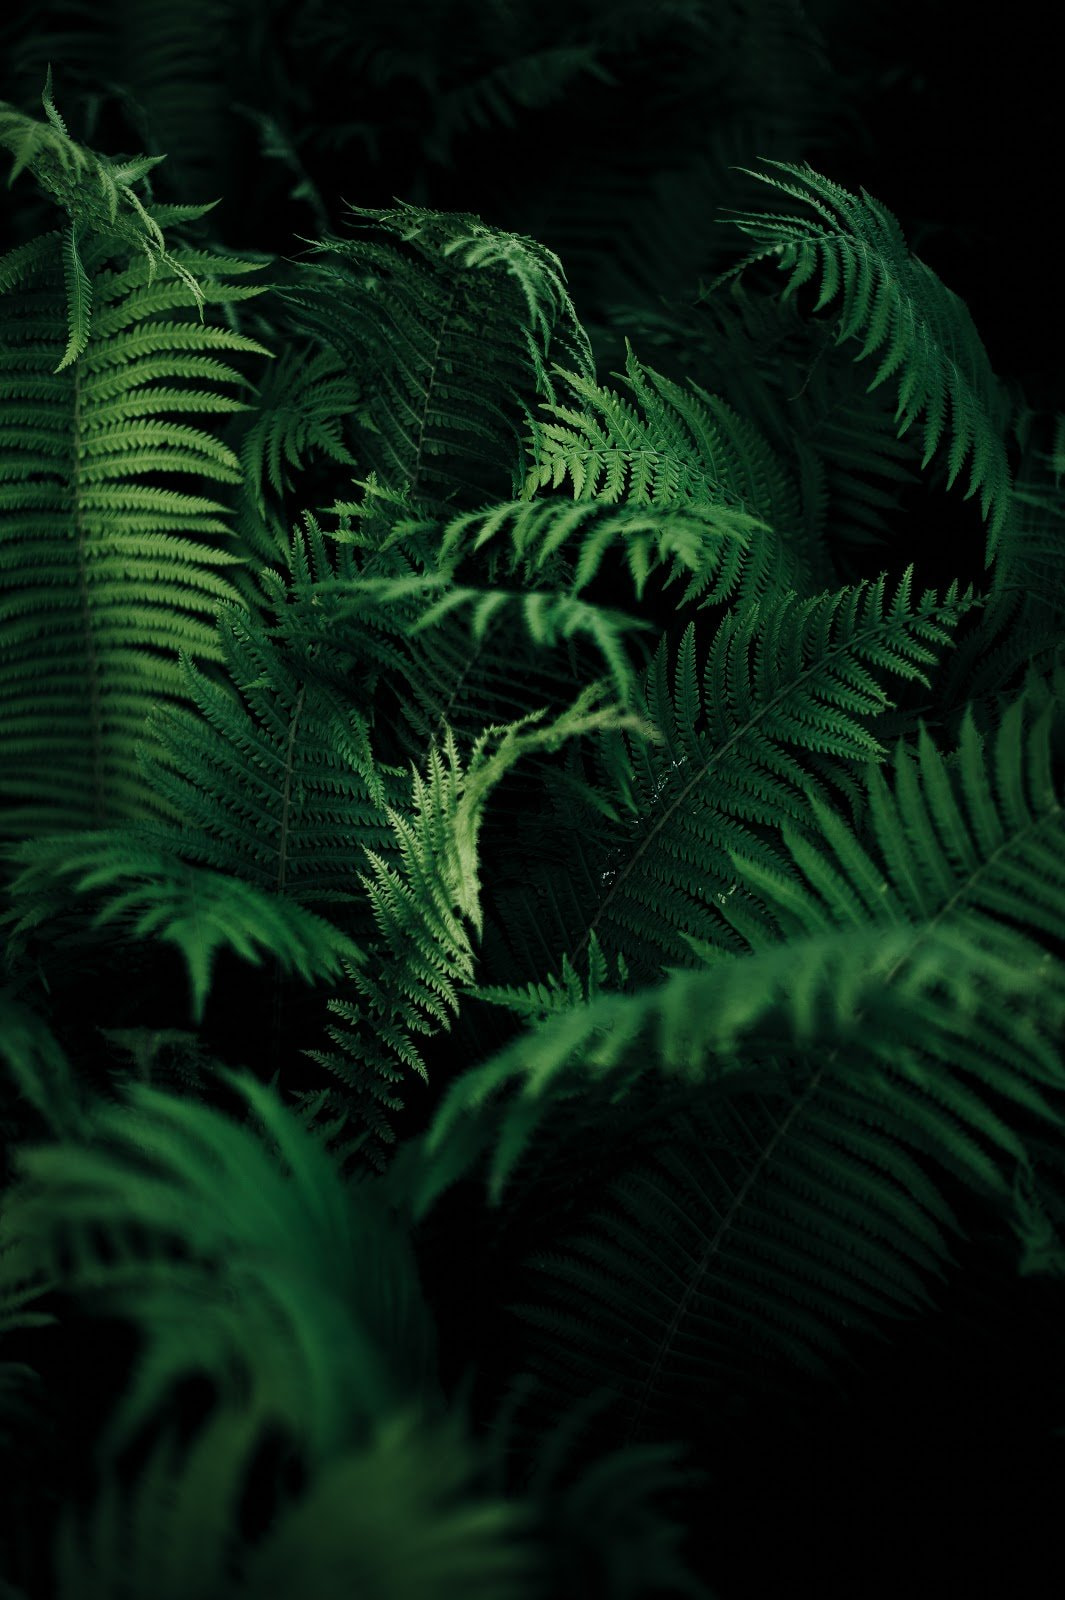 Green ferns by Annie Spratt